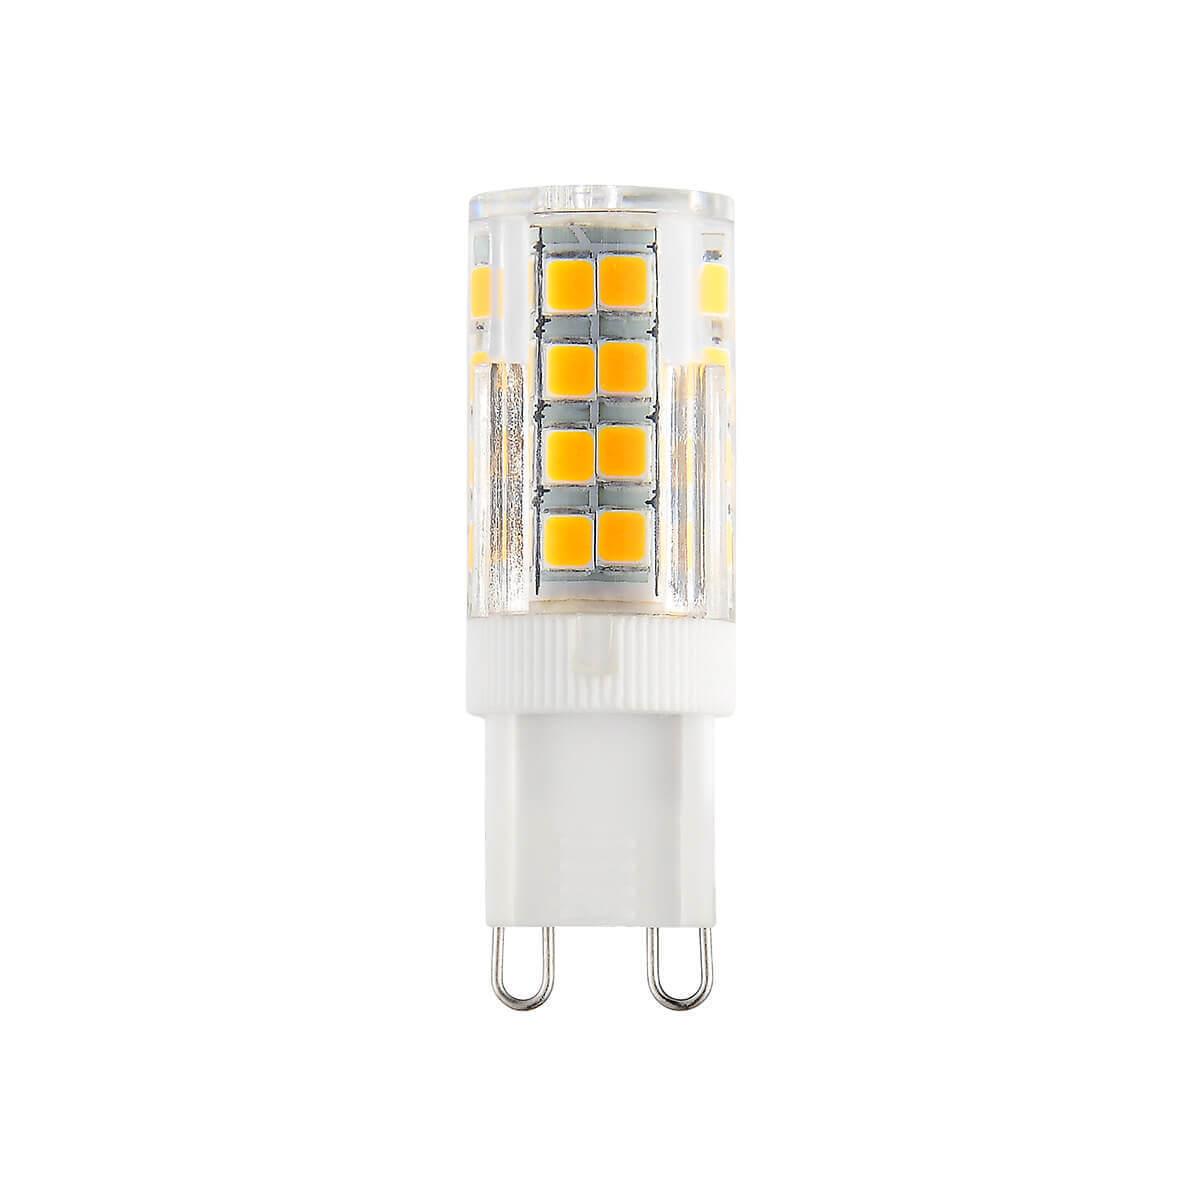 Лампочка Elektrostandard 4690389112997 G9 LED